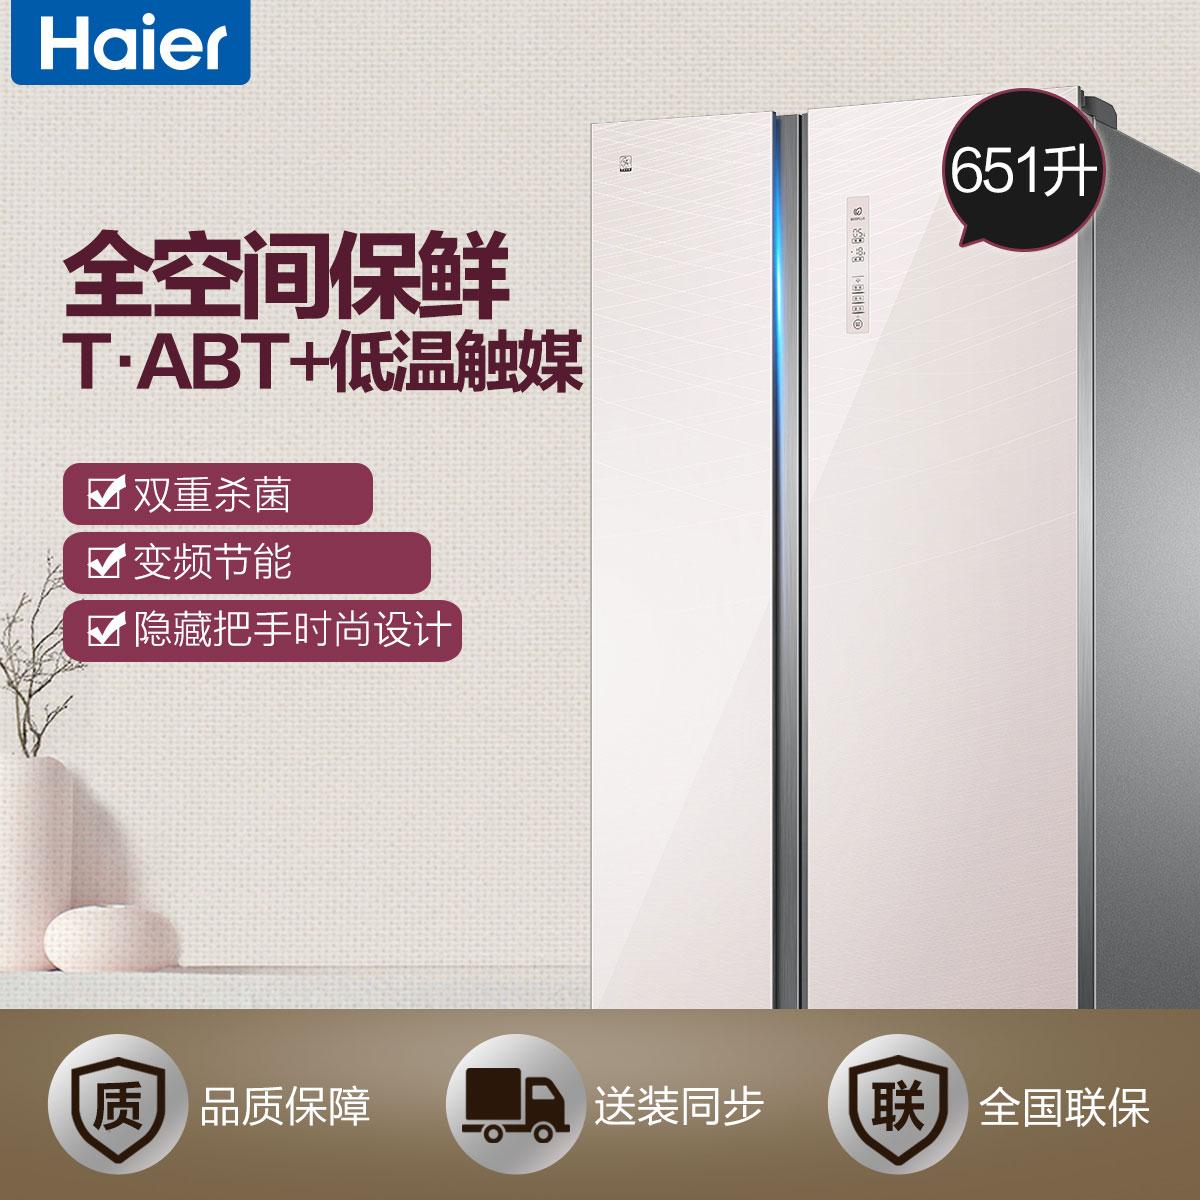 Haier/海尔 冰箱 BCD-651WDEC